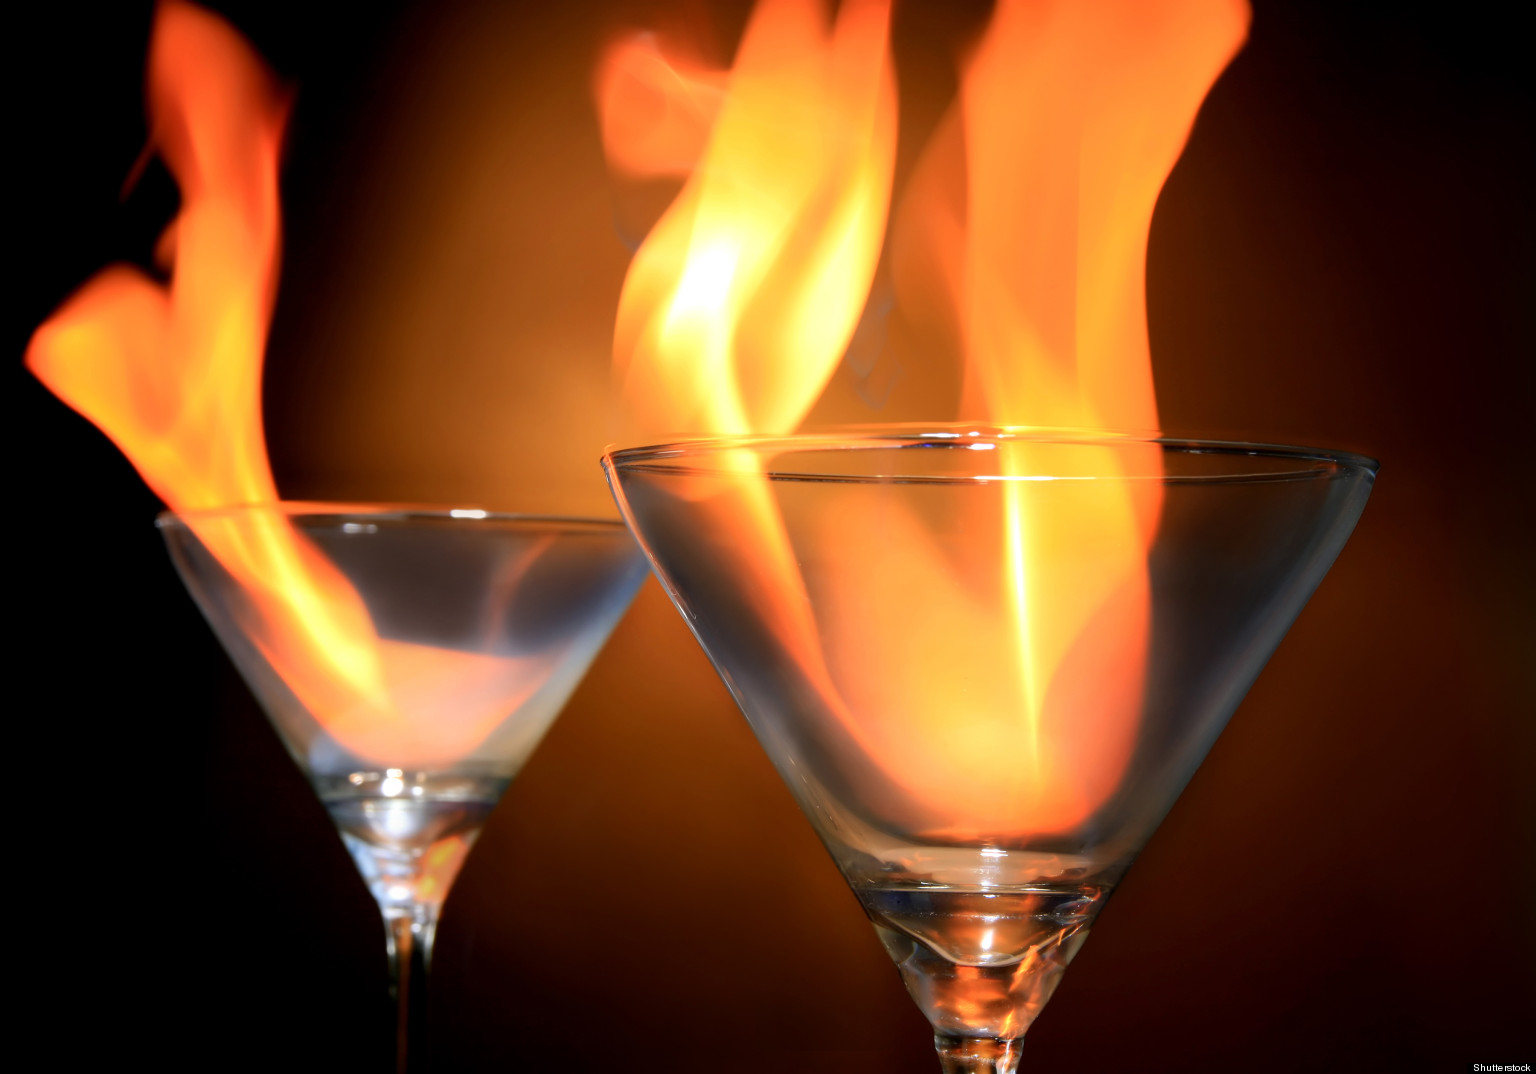 Vodka Fire Sparked By Sunlight In Burnsville Minn Liquor